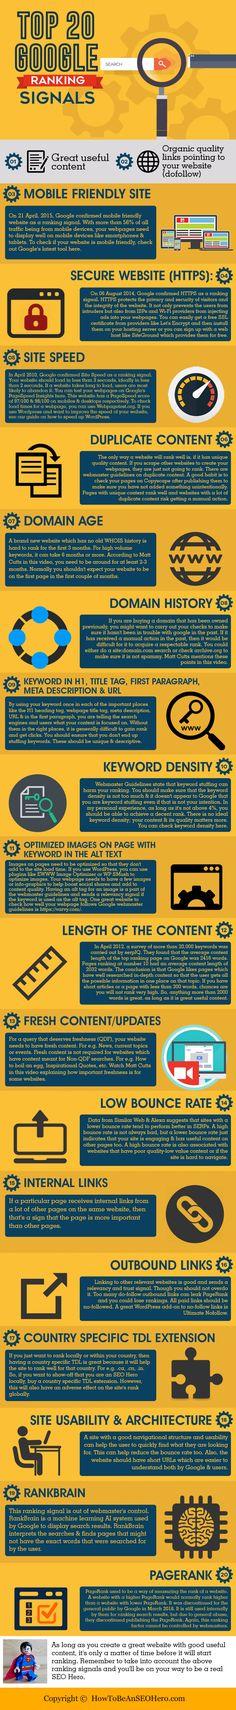 Top 20 Google Ranking Signals Infographic